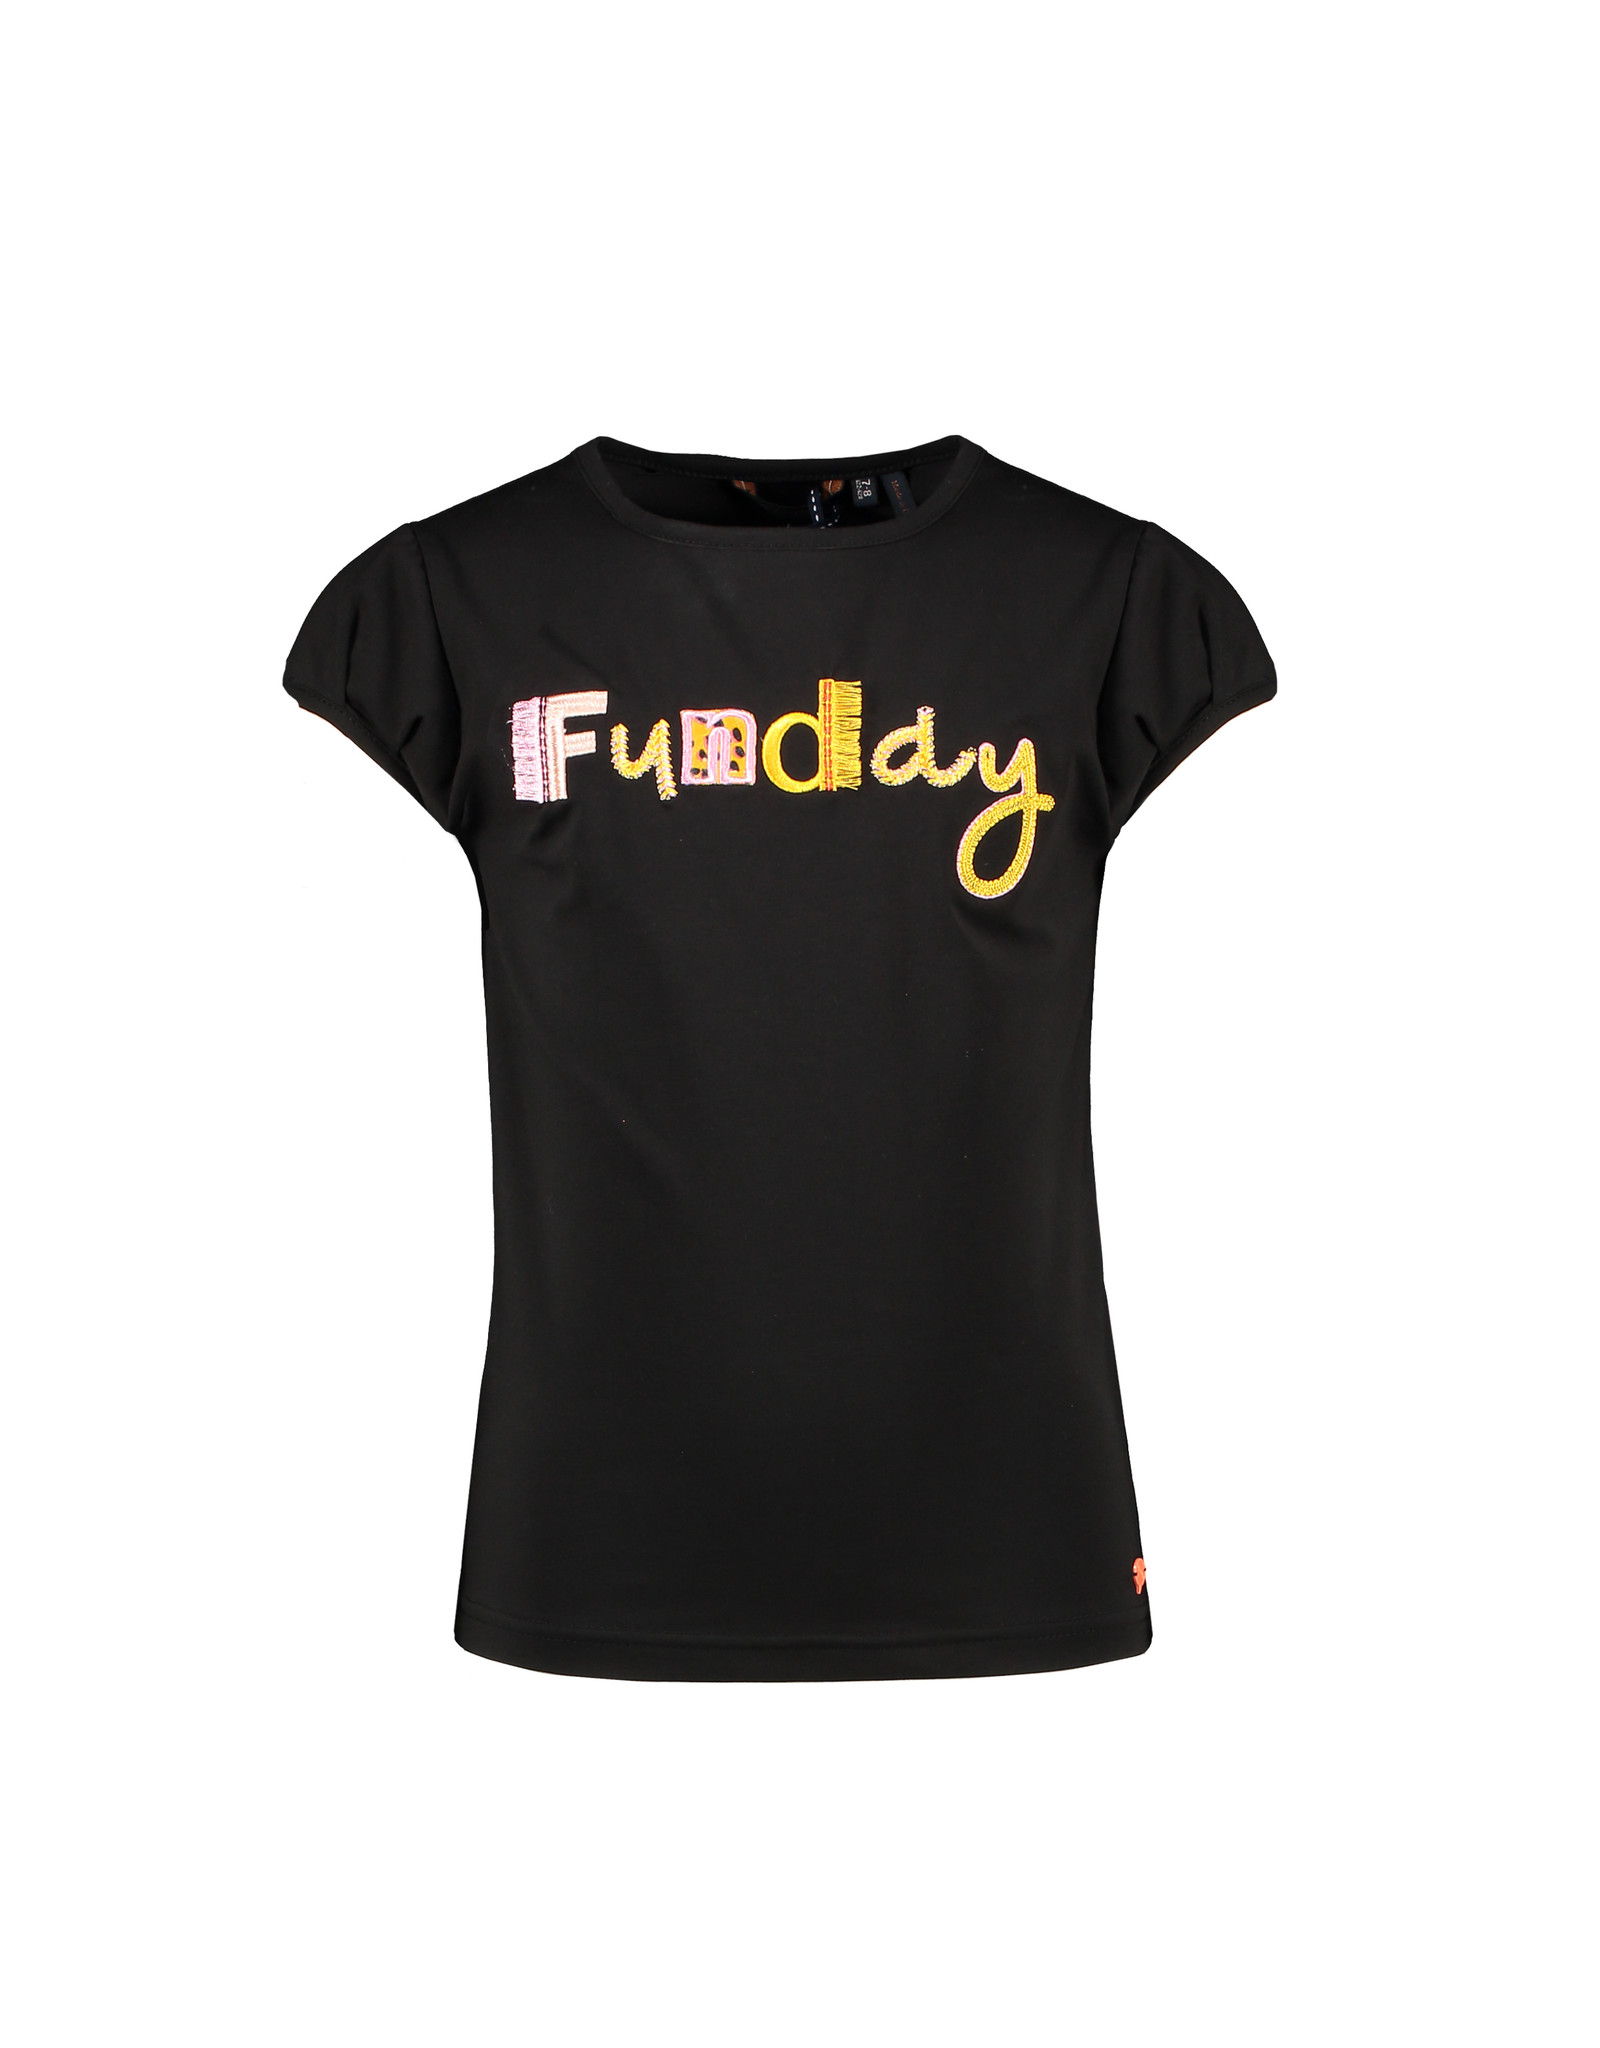 Nono T-shirt funday